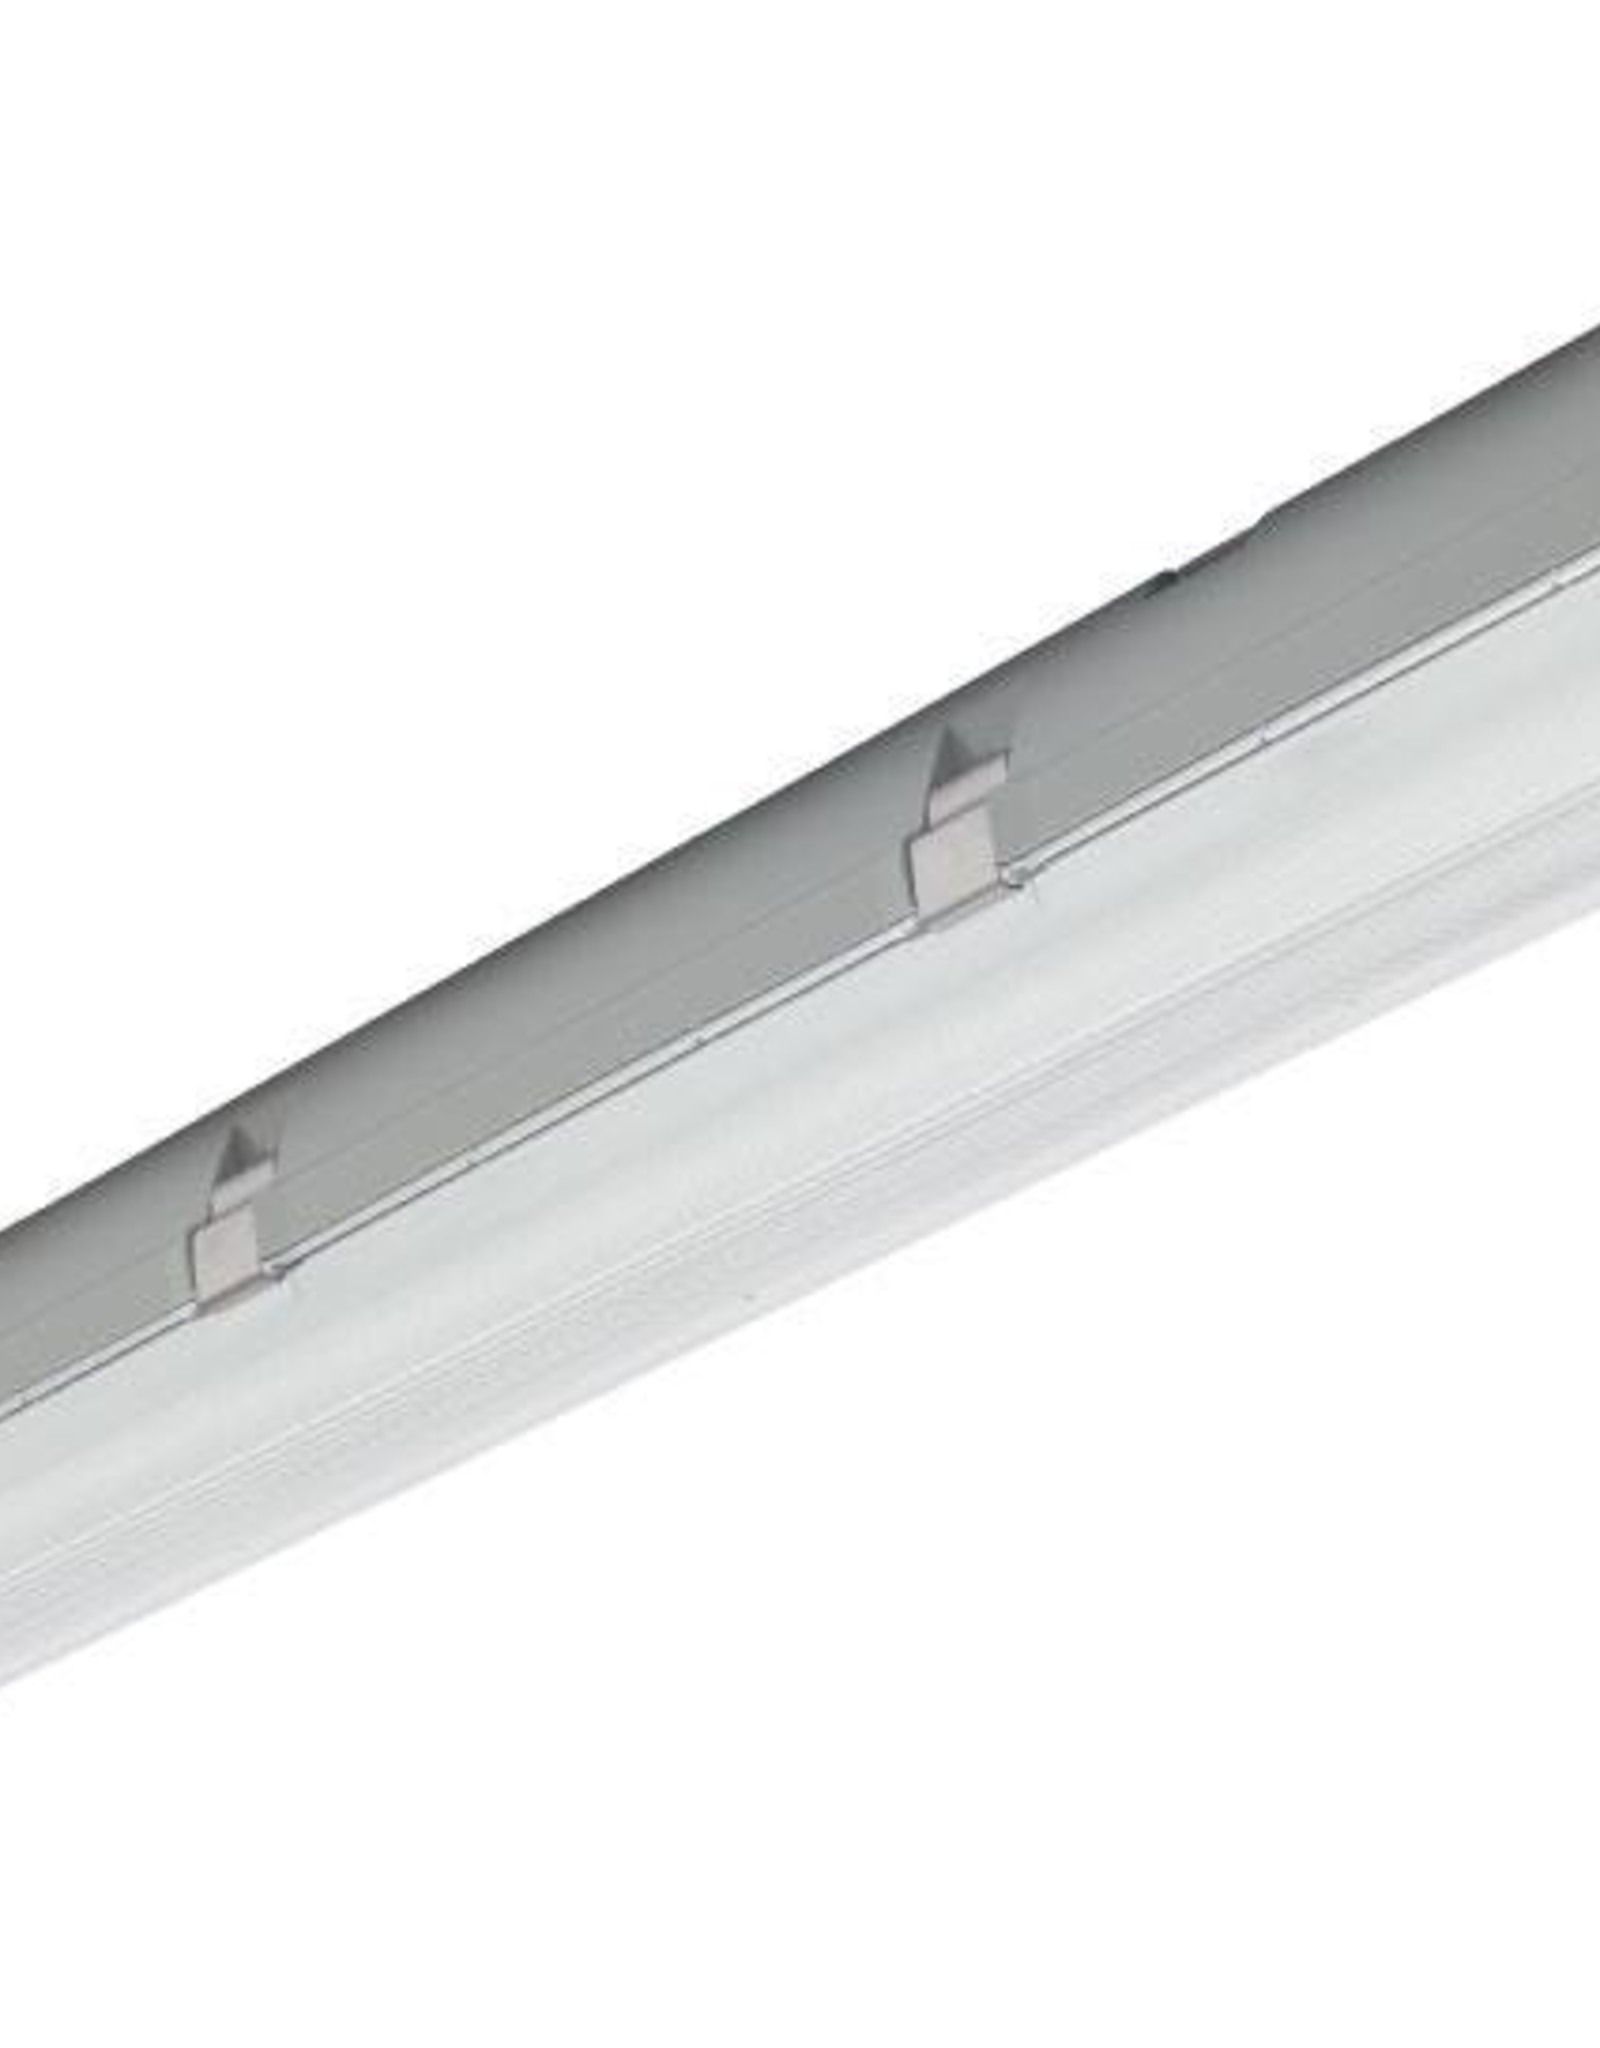 Prima 2x28W HE - ABS - inox clips - dimbare HF ballast